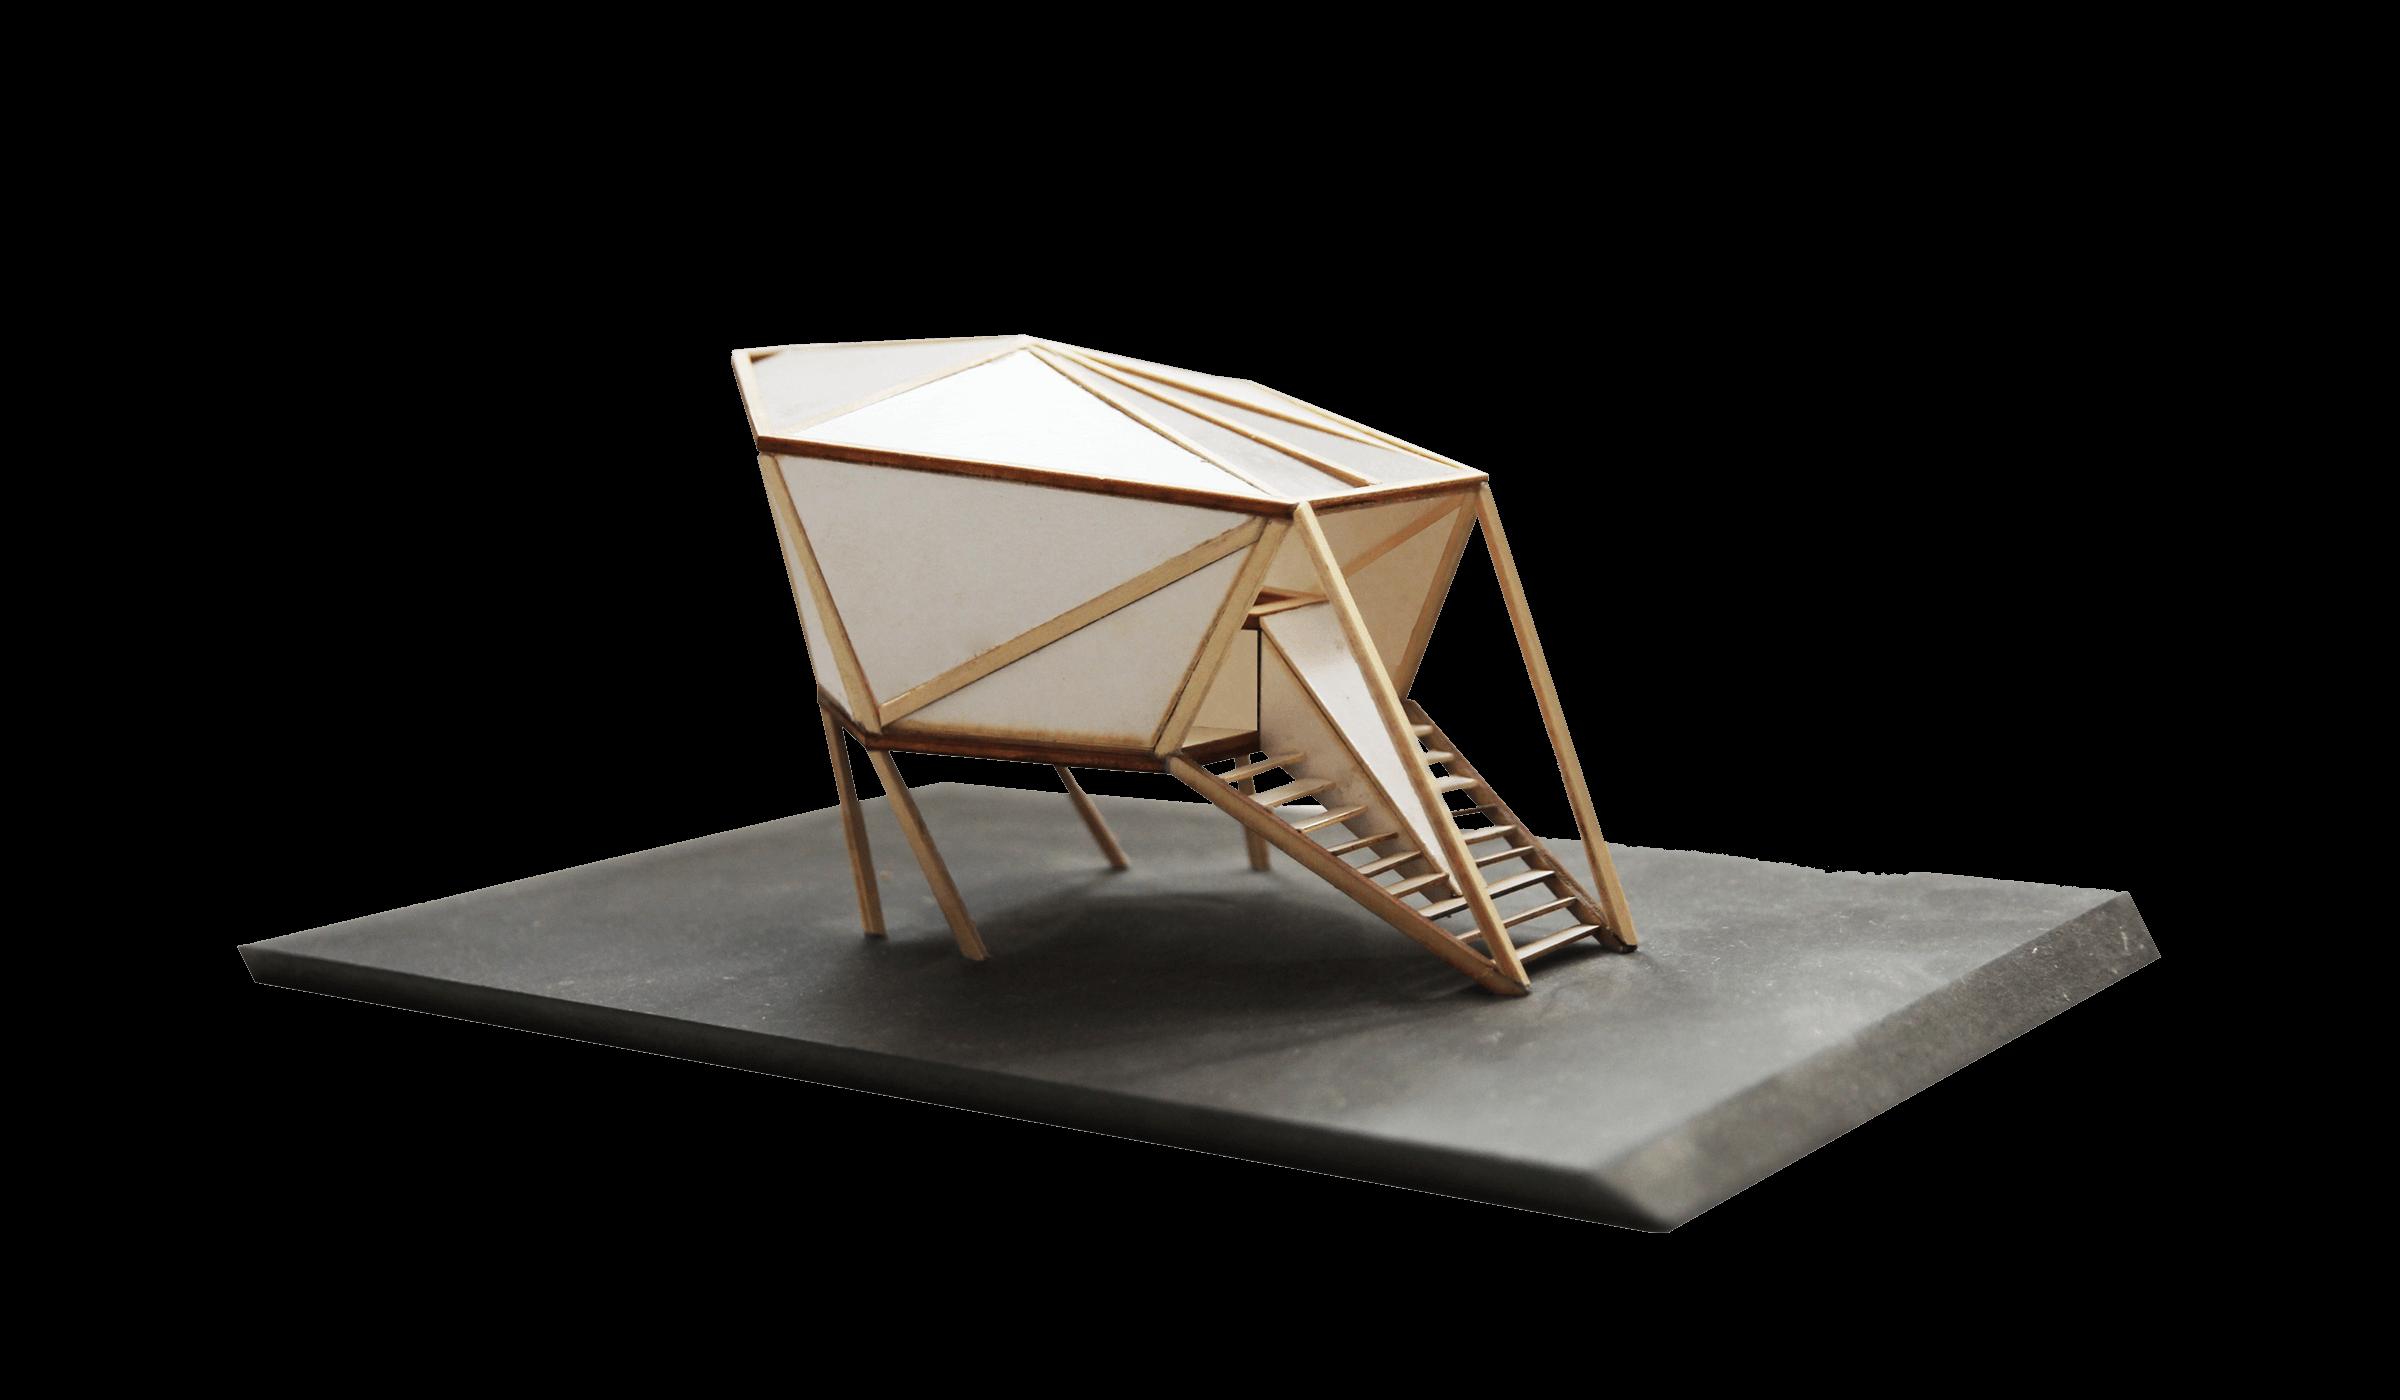 https://fsw-kreatektur.ch/wp-content/uploads/Fsw-Kreatektur-Architektur-Modellbau-Skybar.png